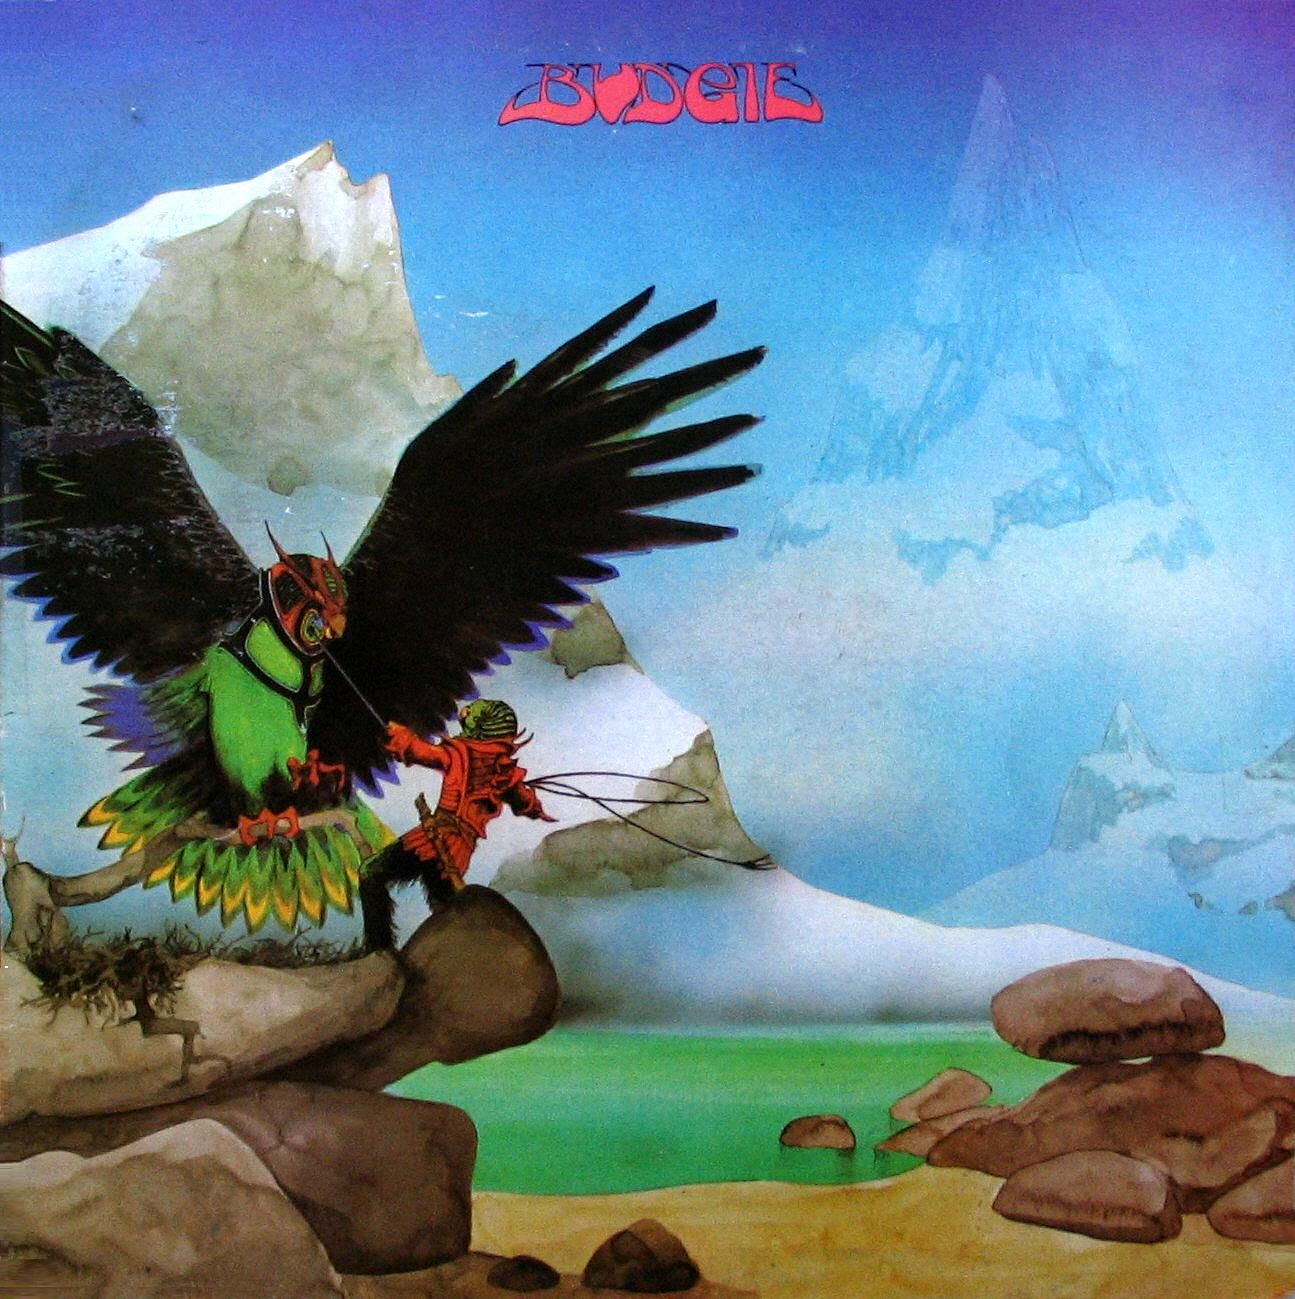 Budgie - Breadfan - 1974 (Live) HD/HQ - YouTube